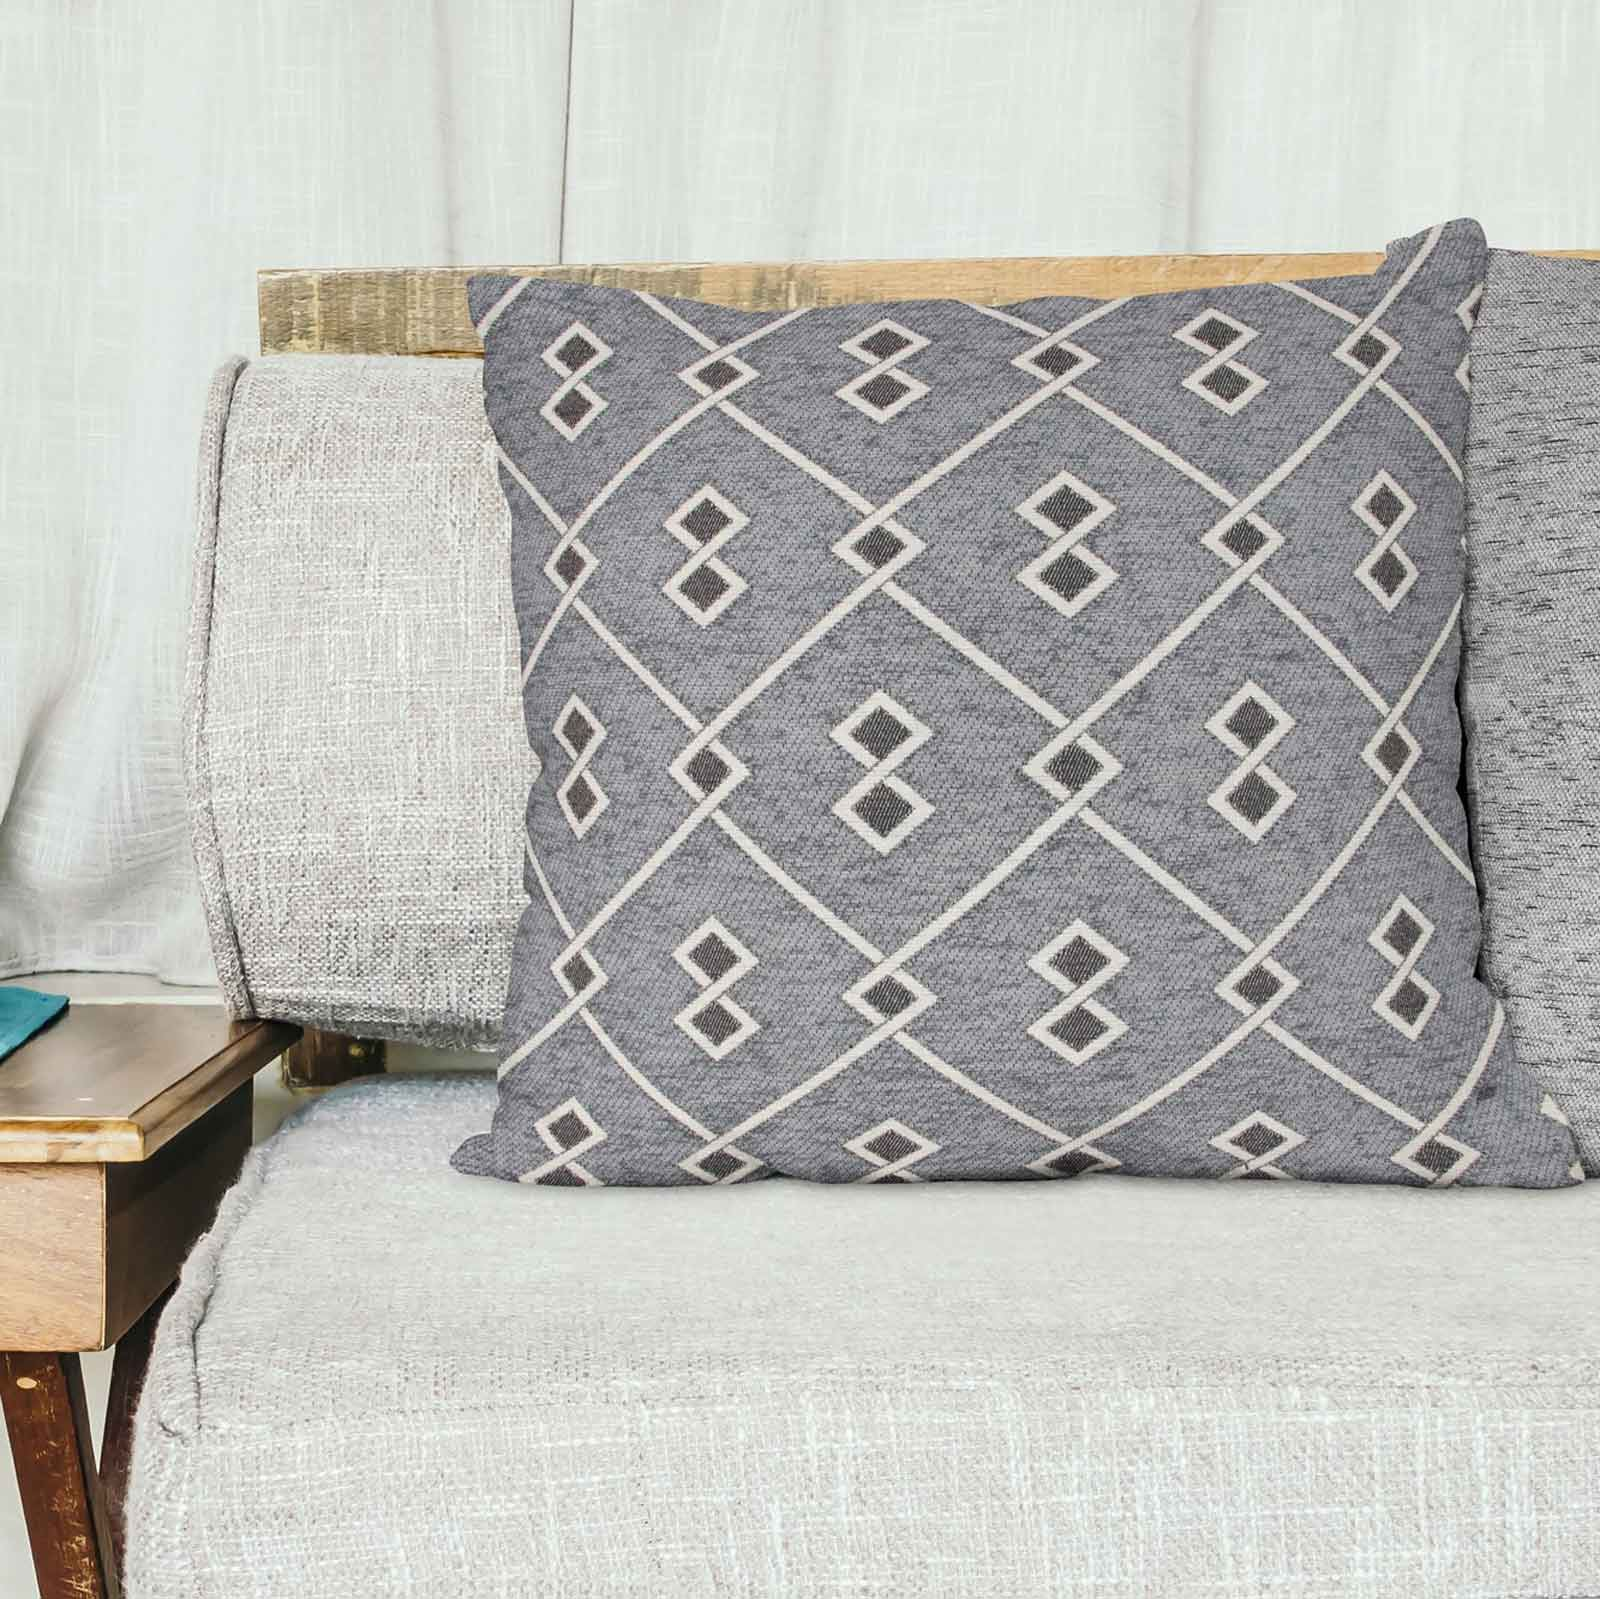 "Shelbourne Cushion Cover Luxury Geometric Diamond Chenille Covers 18/"" x 18/"""